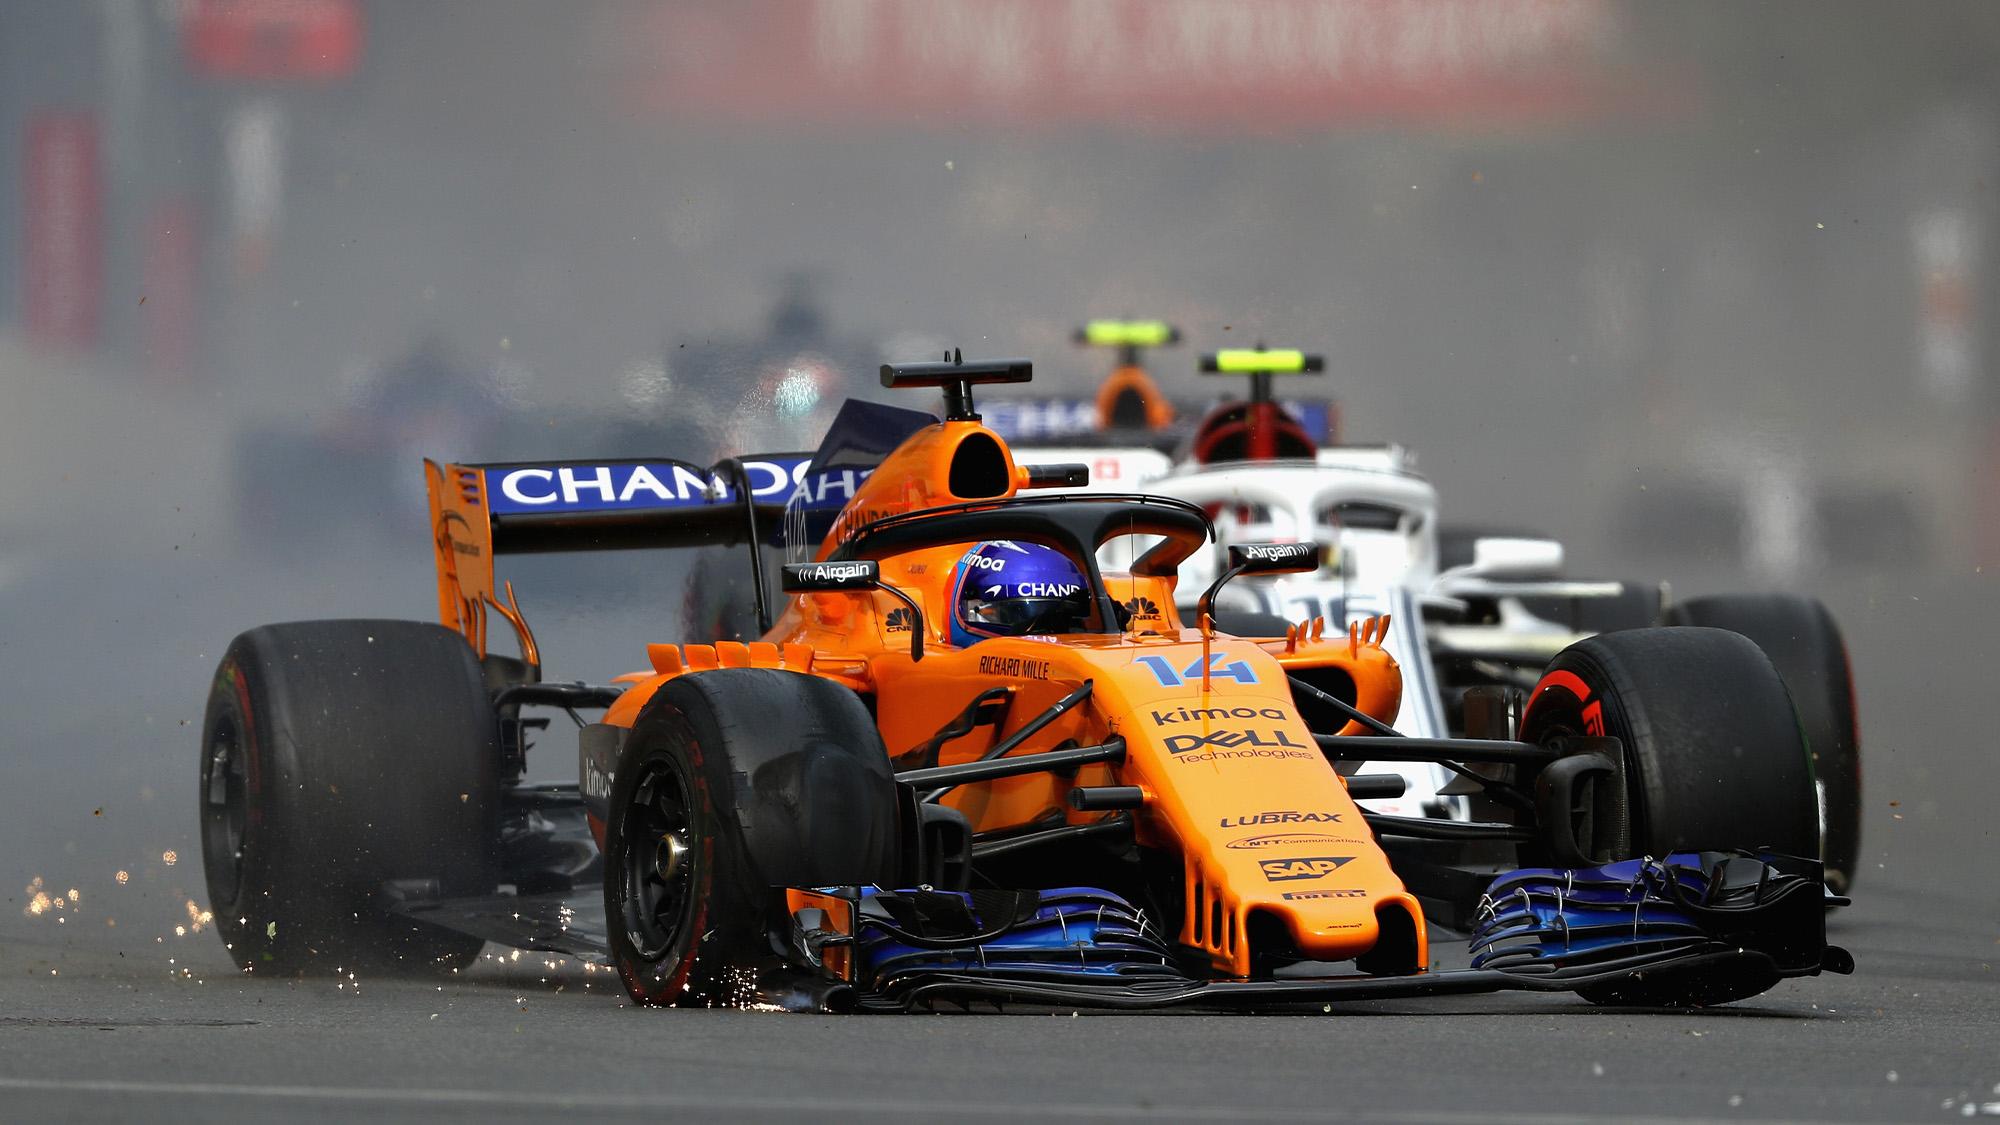 Fernando Alonso drives his punctured McLaren in the 2018 Azerbaijan Grand Prix in Baku